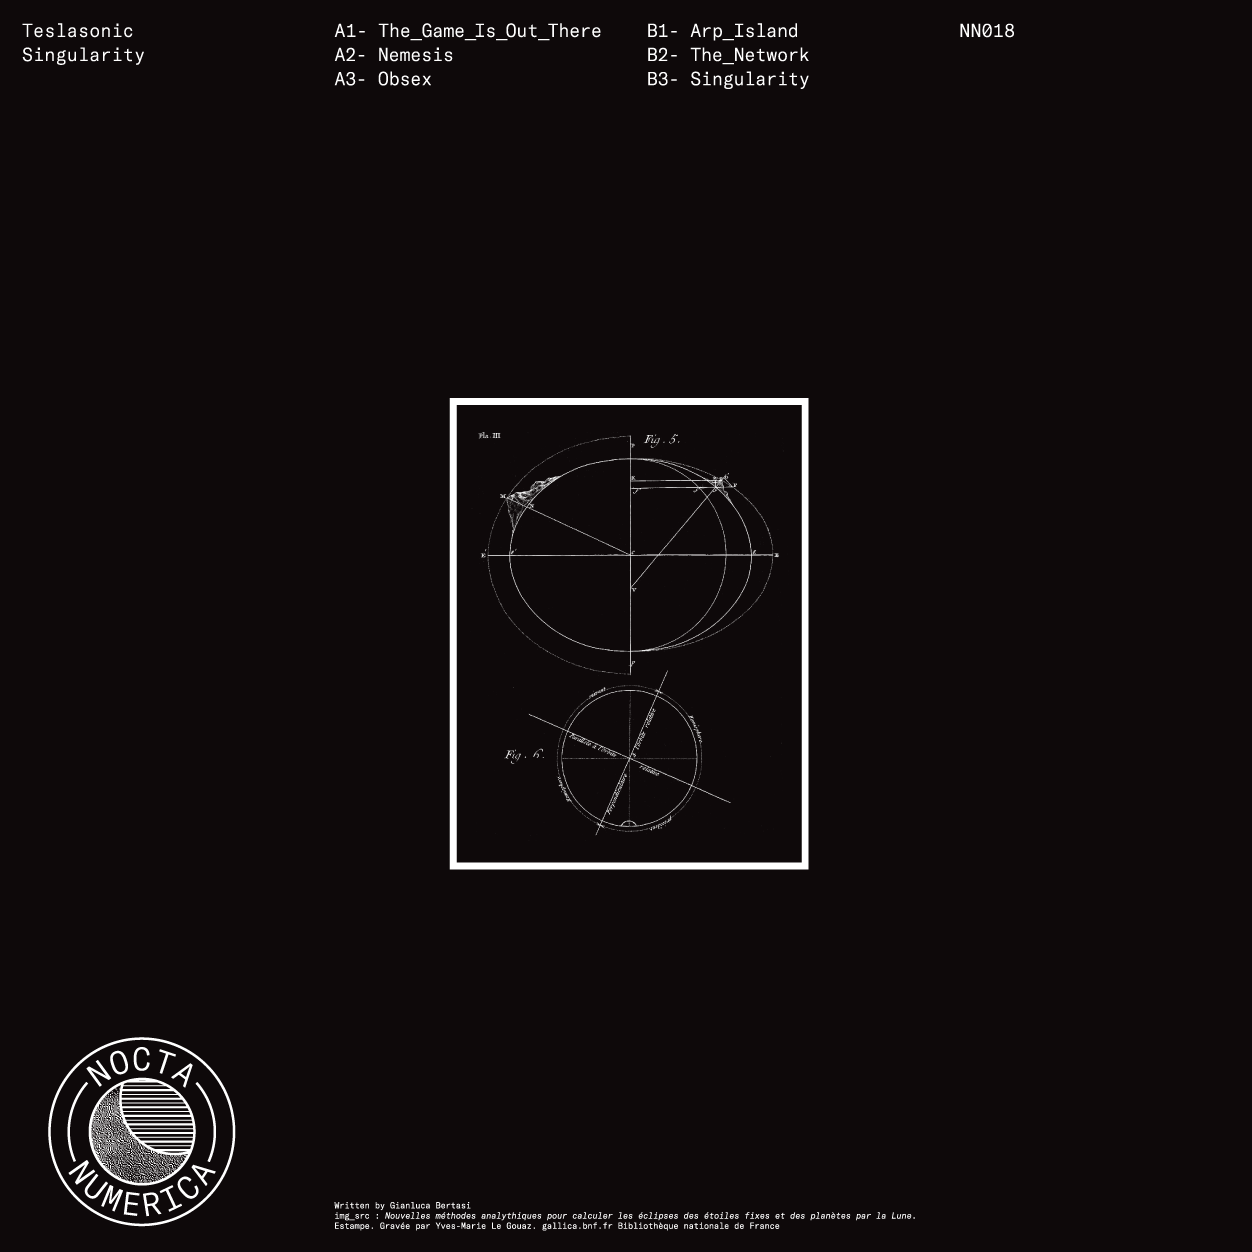 Teslasonic - Singularity